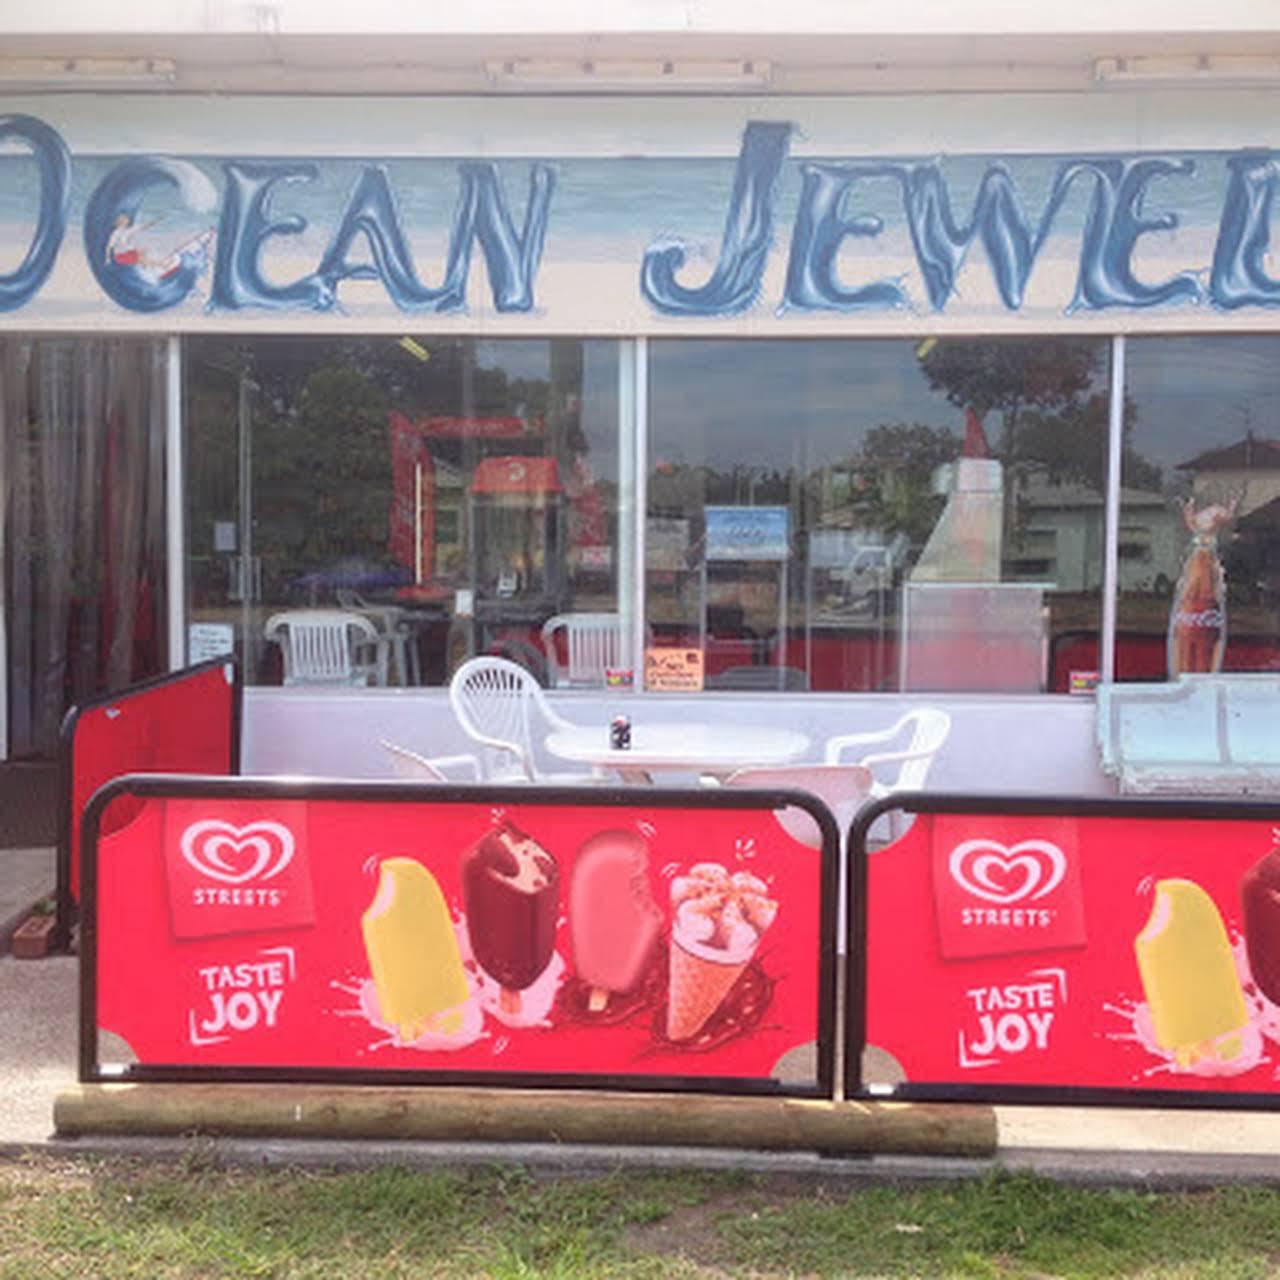 Ocean Jewel Takeaway - Takeaway restaurant. Fish and Chips. Burgers ...